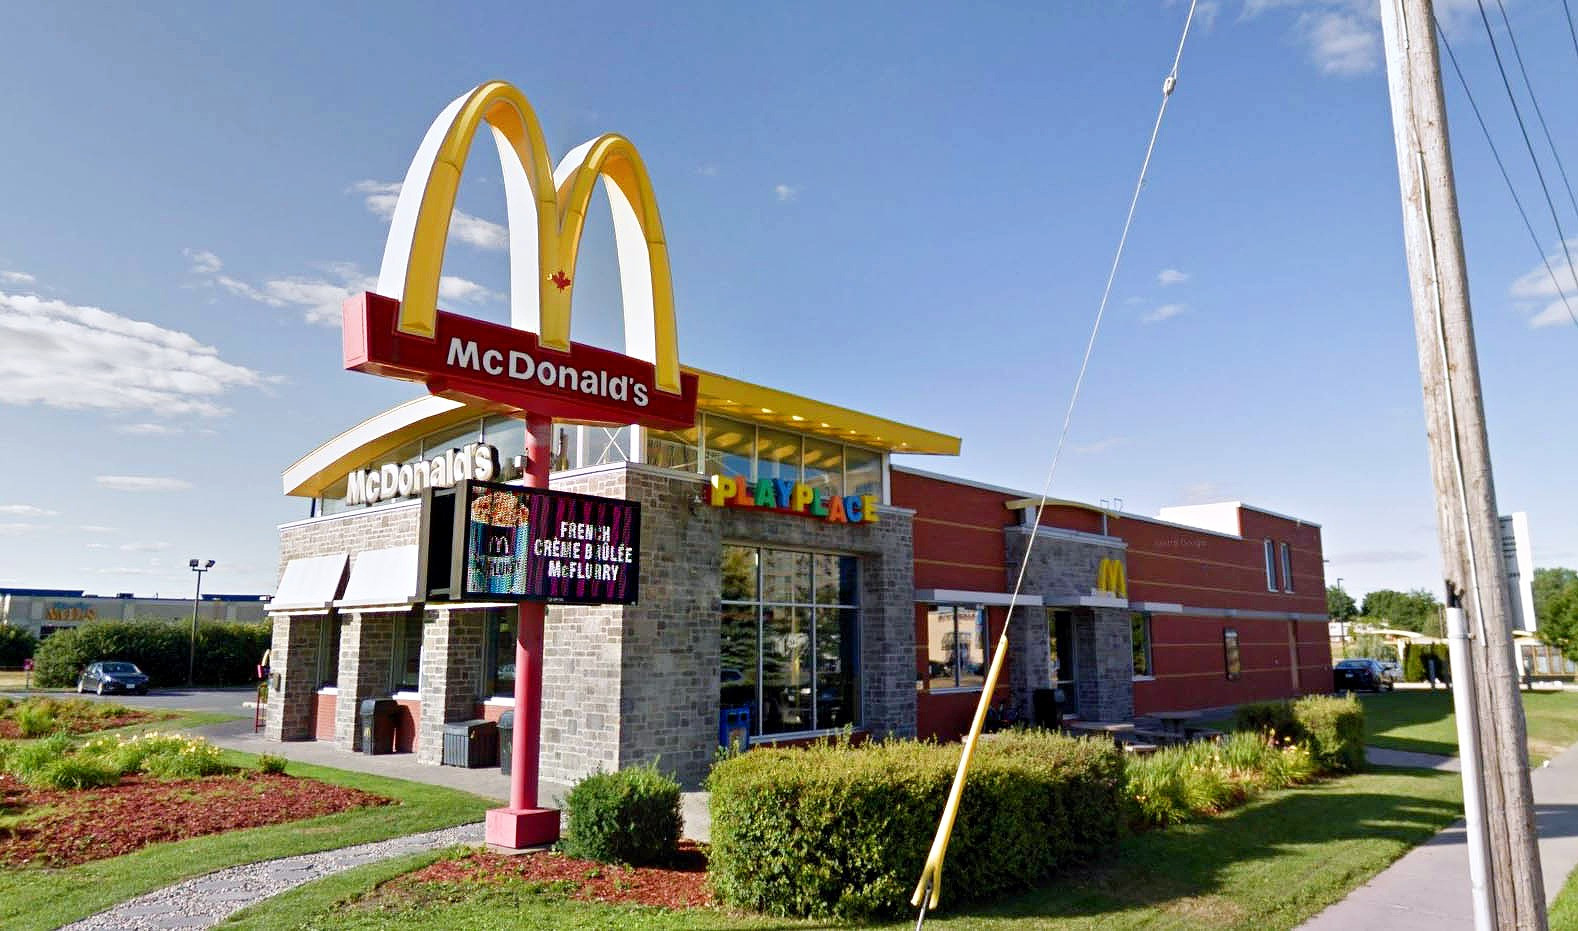 McDonald's restaurant completed building